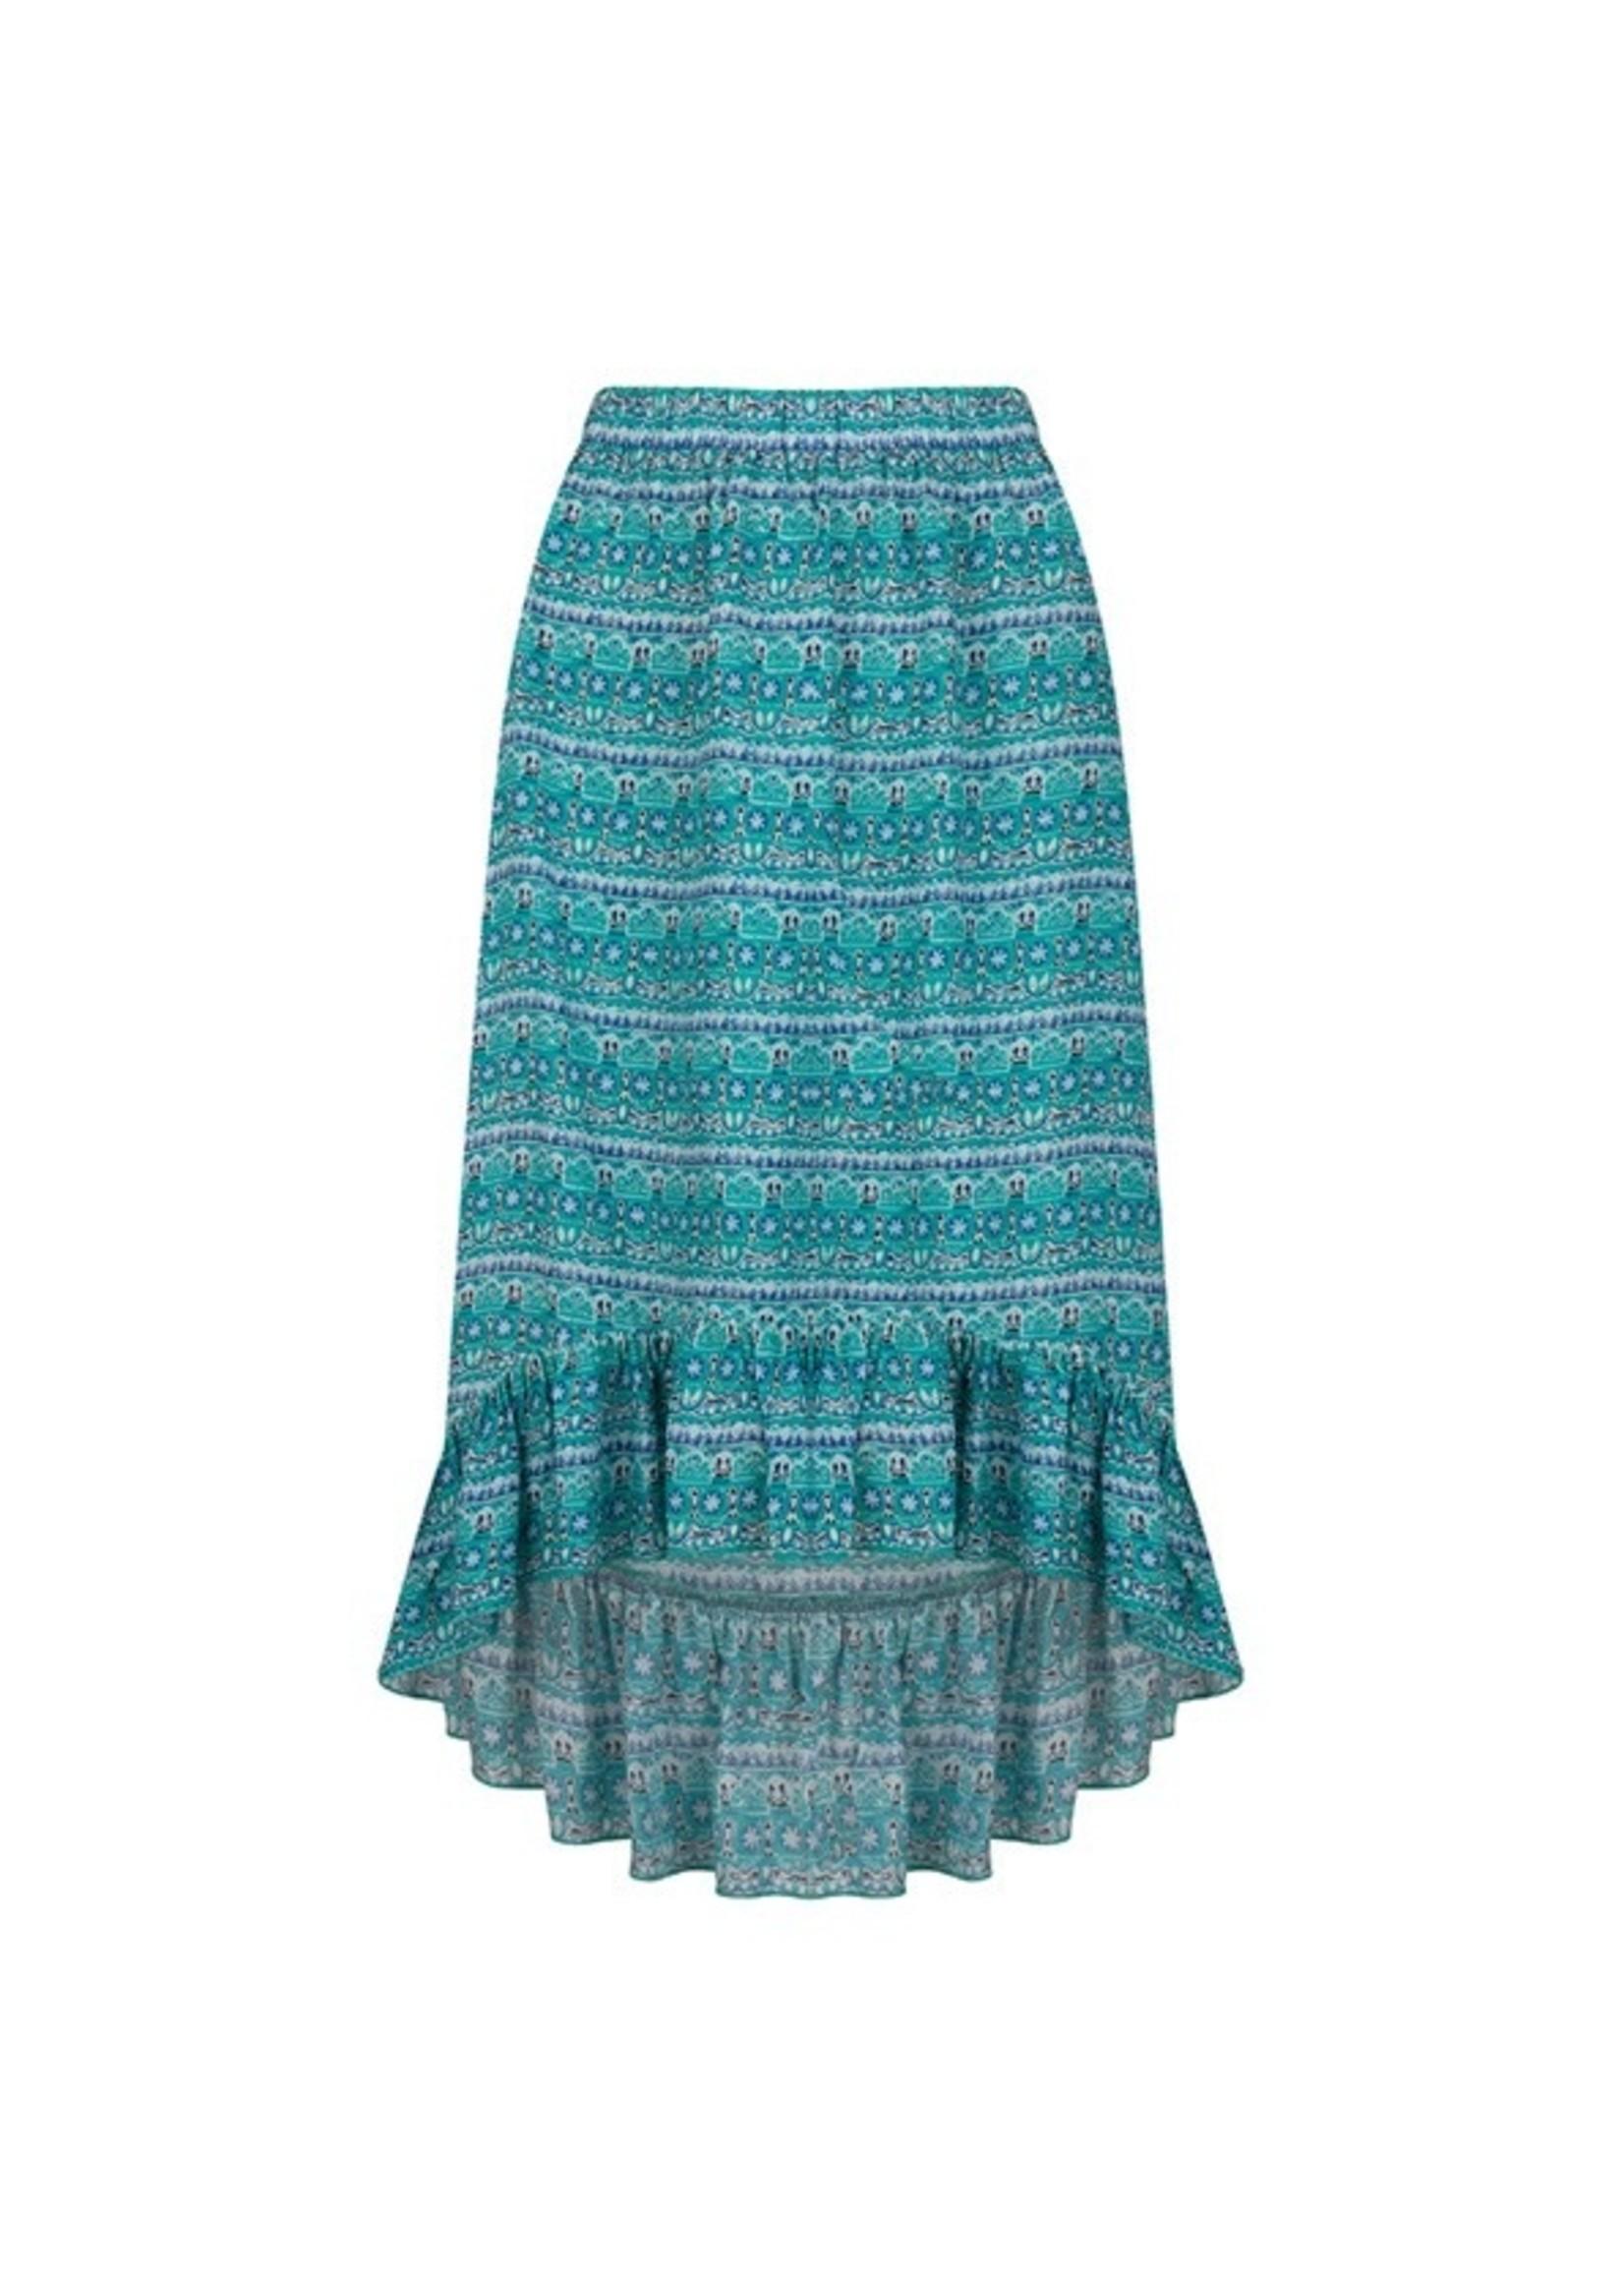 Esqualo Skirt high low blue lagoon Print